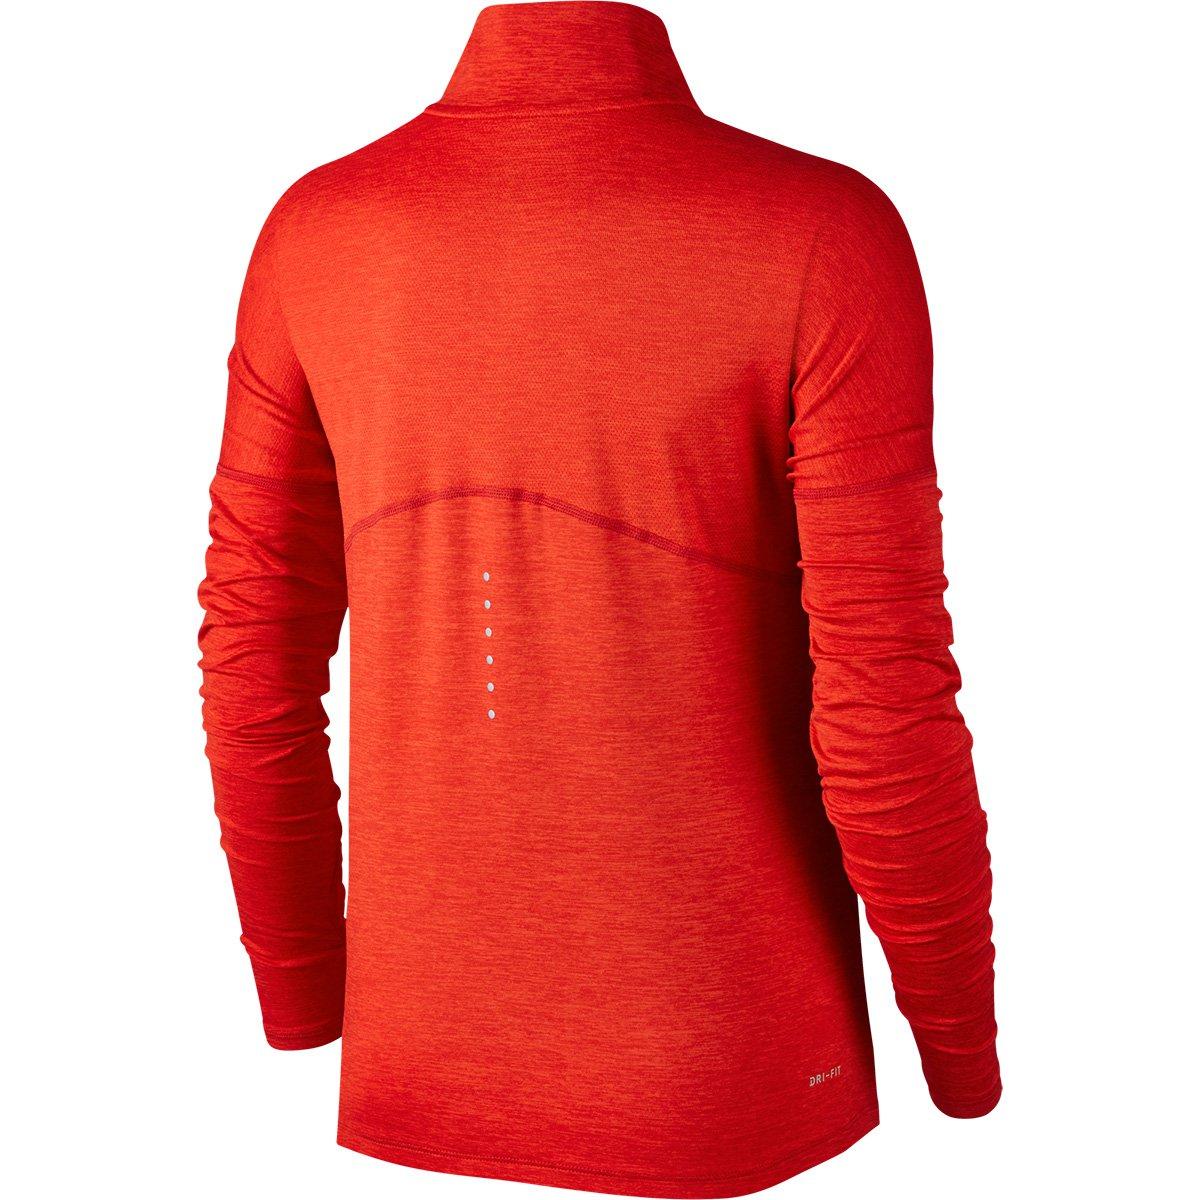 2836d8b3c9 Camiseta Nike Dry Element Half-Zip Manga Longa Feminina - Compre ...